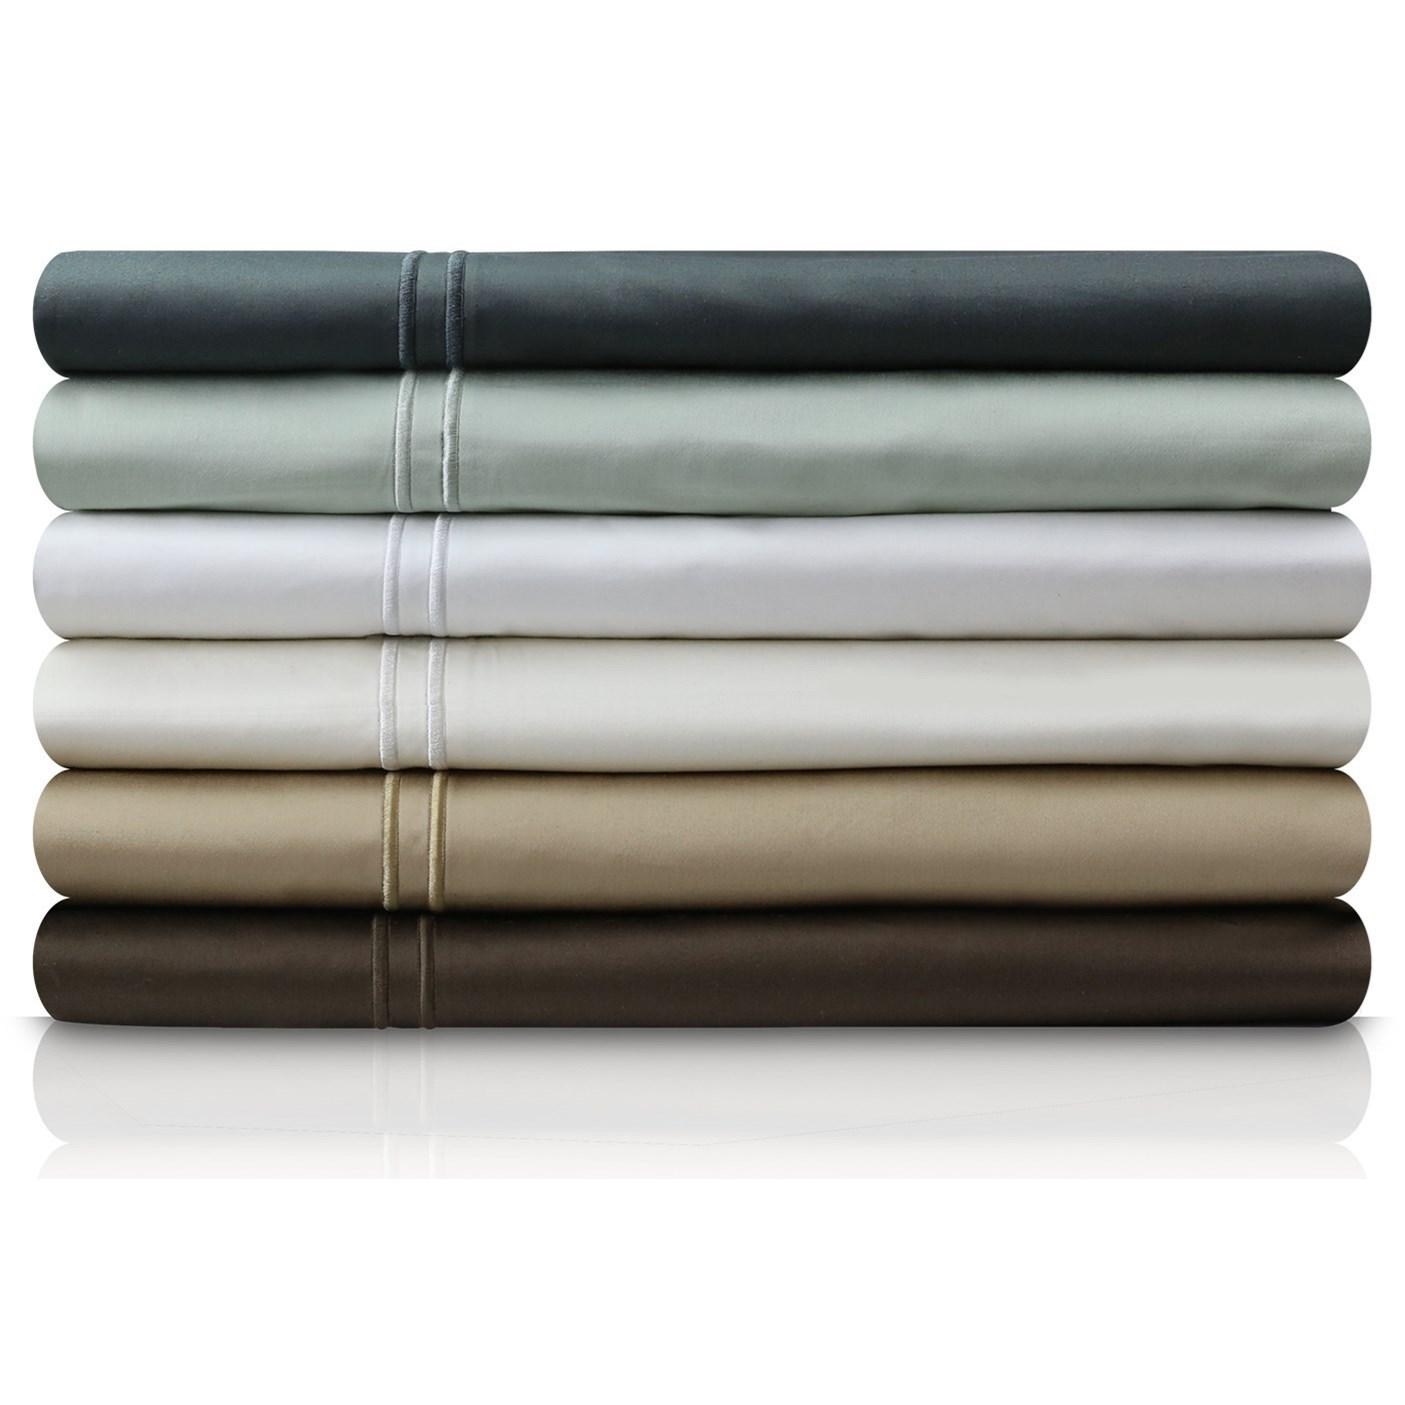 Malouf Egyptian Cotton Full 600 TC Egyptian Cotton Sheet Set - Item Number: MA06FFCHSS